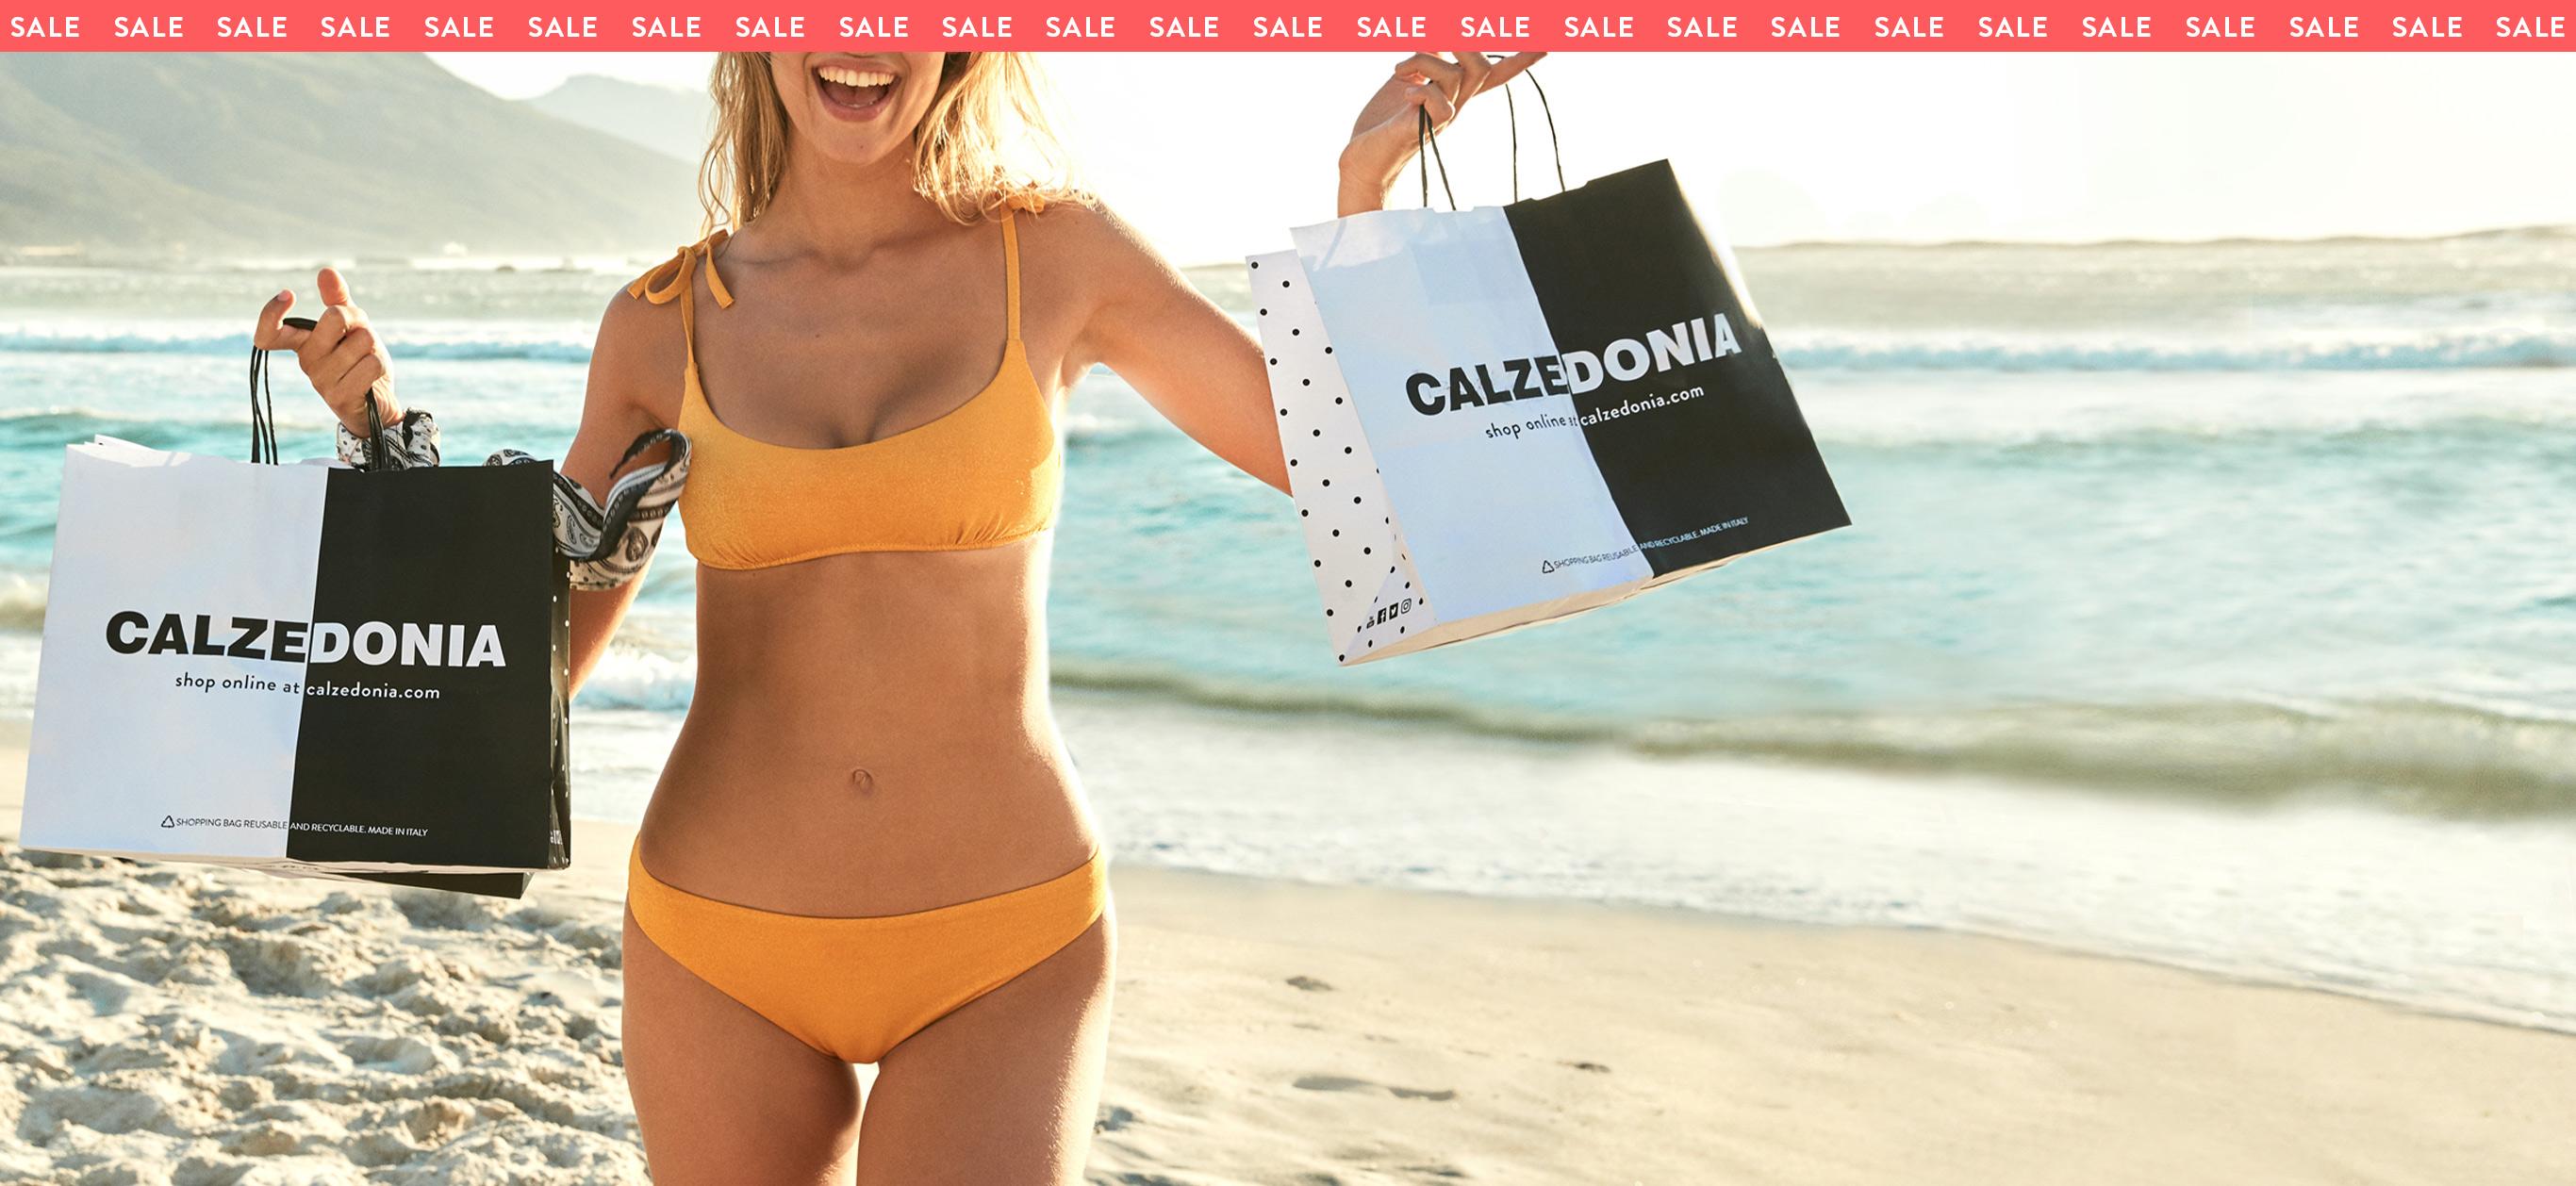 CALZEDONIA SALE